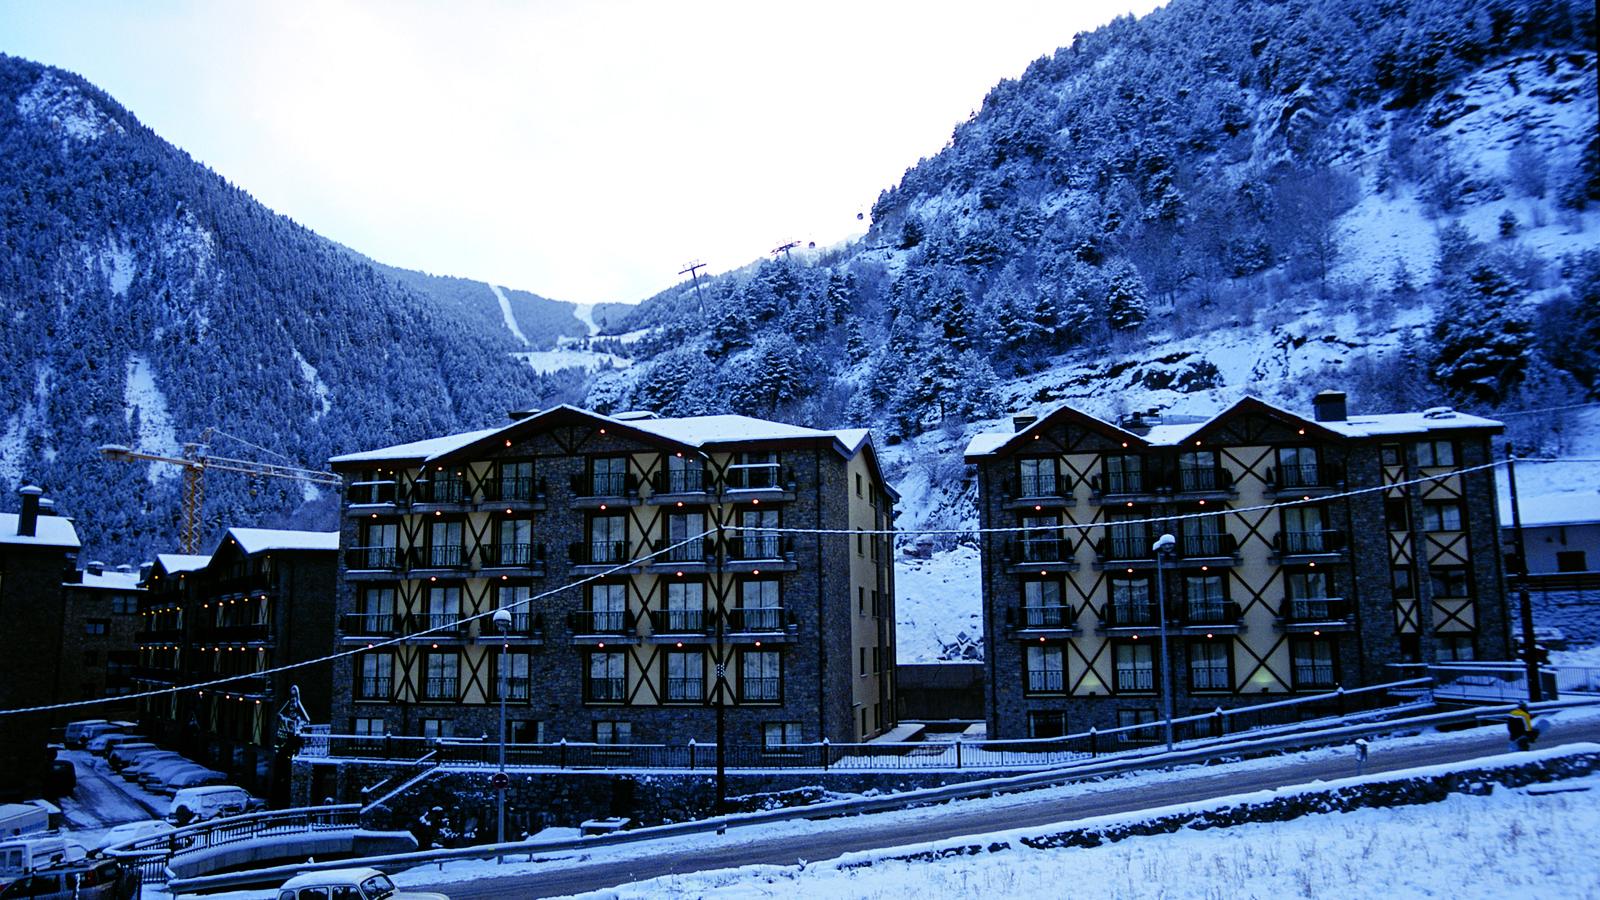 Arinsal Andorra  City pictures : Ski Andorra Arinsal & Pal Hotel Princesa Parc Ski Holidays 2013 ...